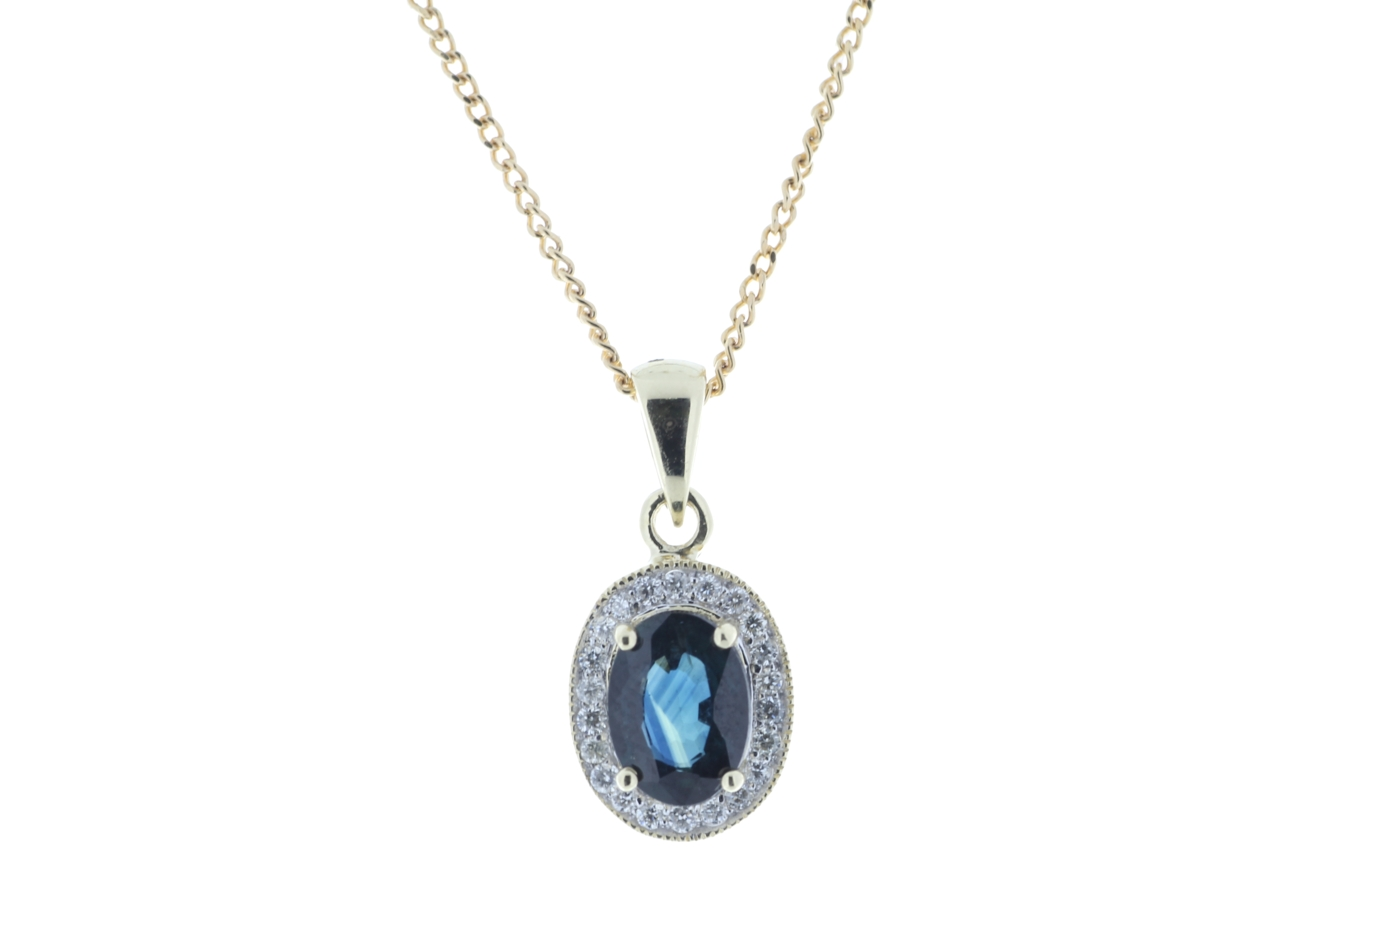 Lot 46 - 9ct Yellow Gold Diamond And Sapphire Pendant 0.11 Carats